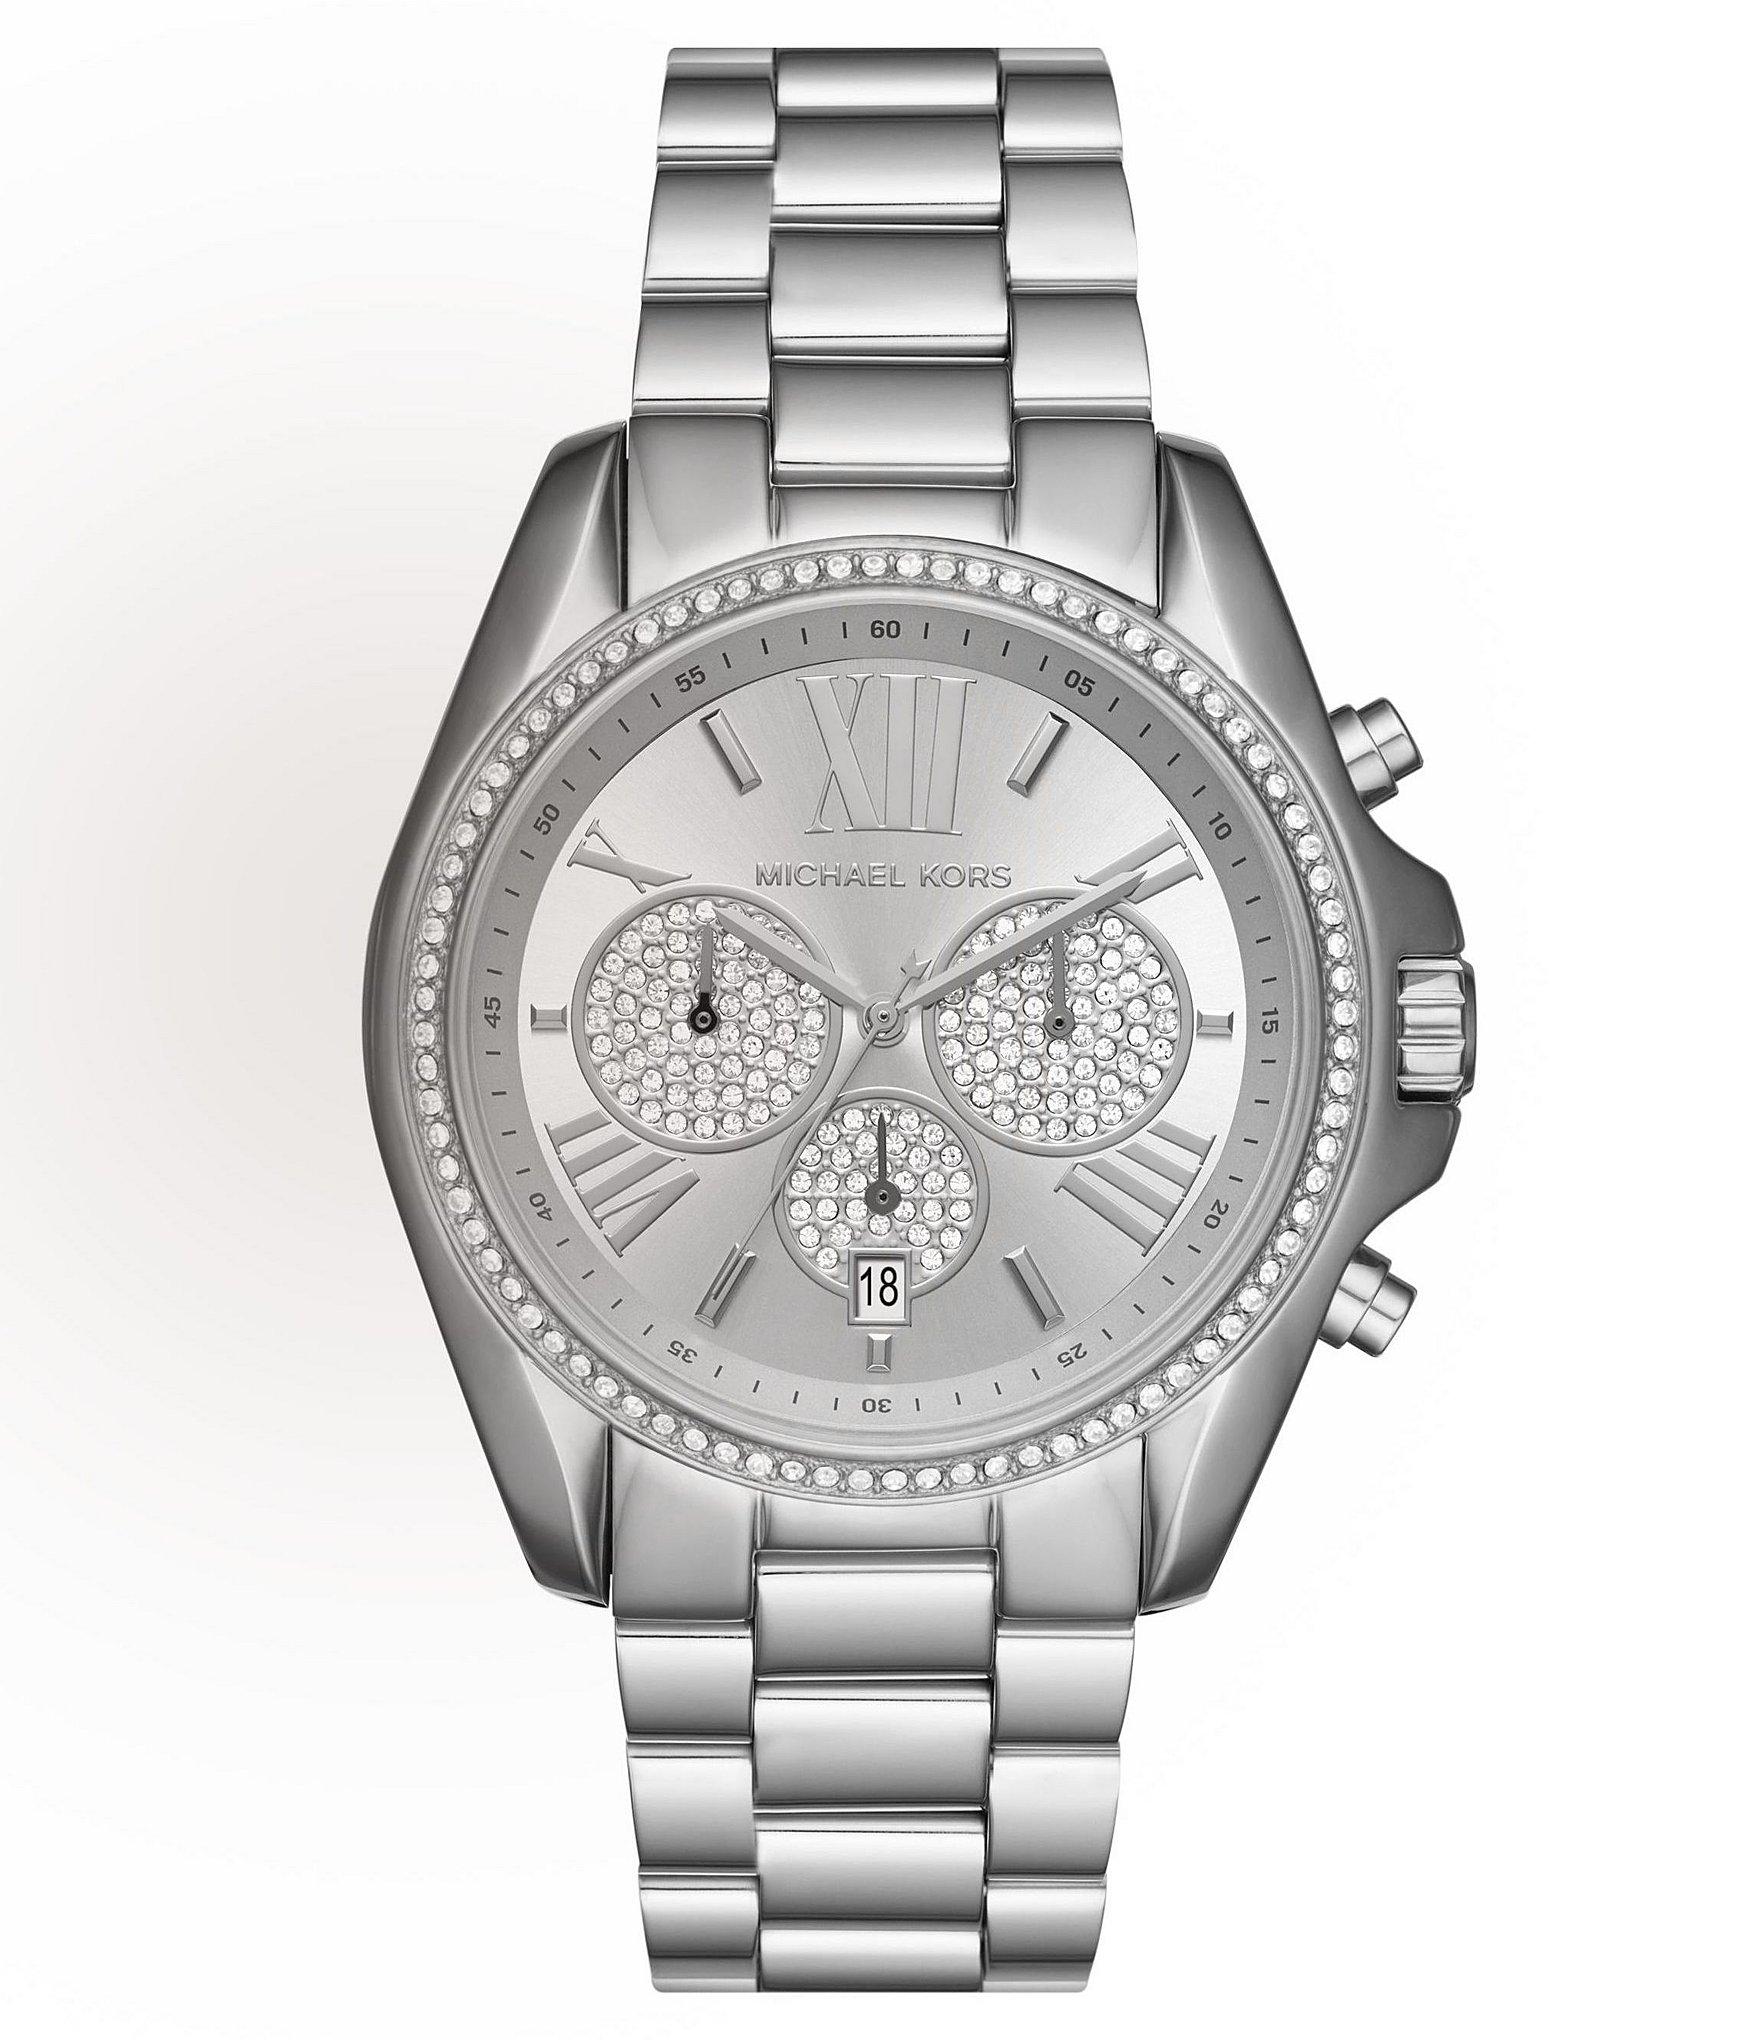 michael kors bradshaw pav 233 chronograph date bracelet